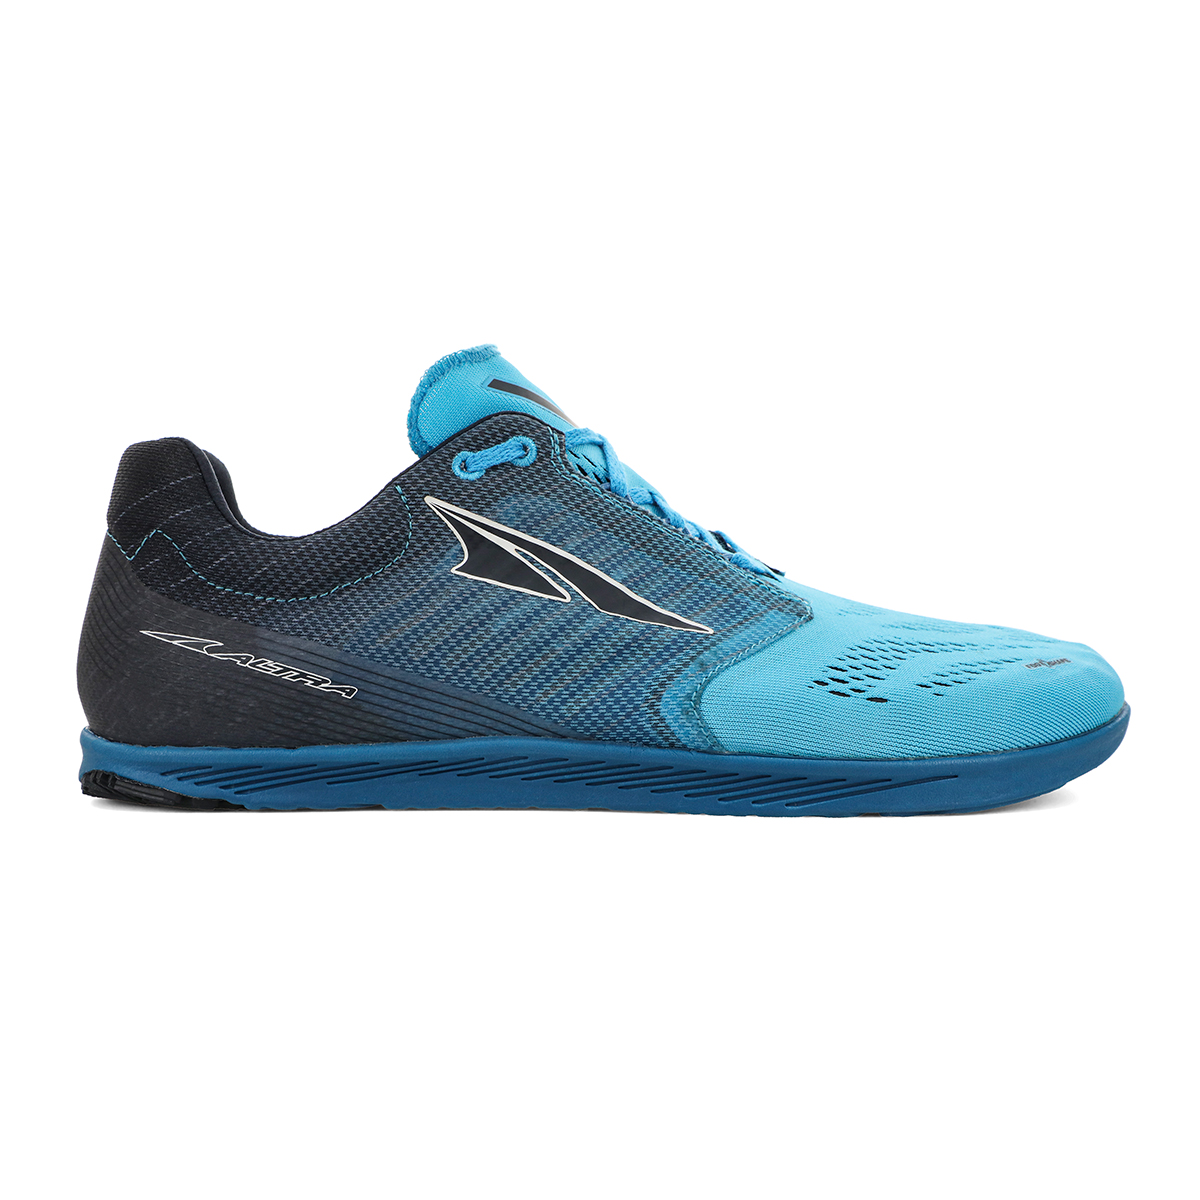 Altra Vanish R Running Shoe - Color: Electric Blue - Size: M4/W5.5 - Width: Regular, Electric Blue, large, image 1